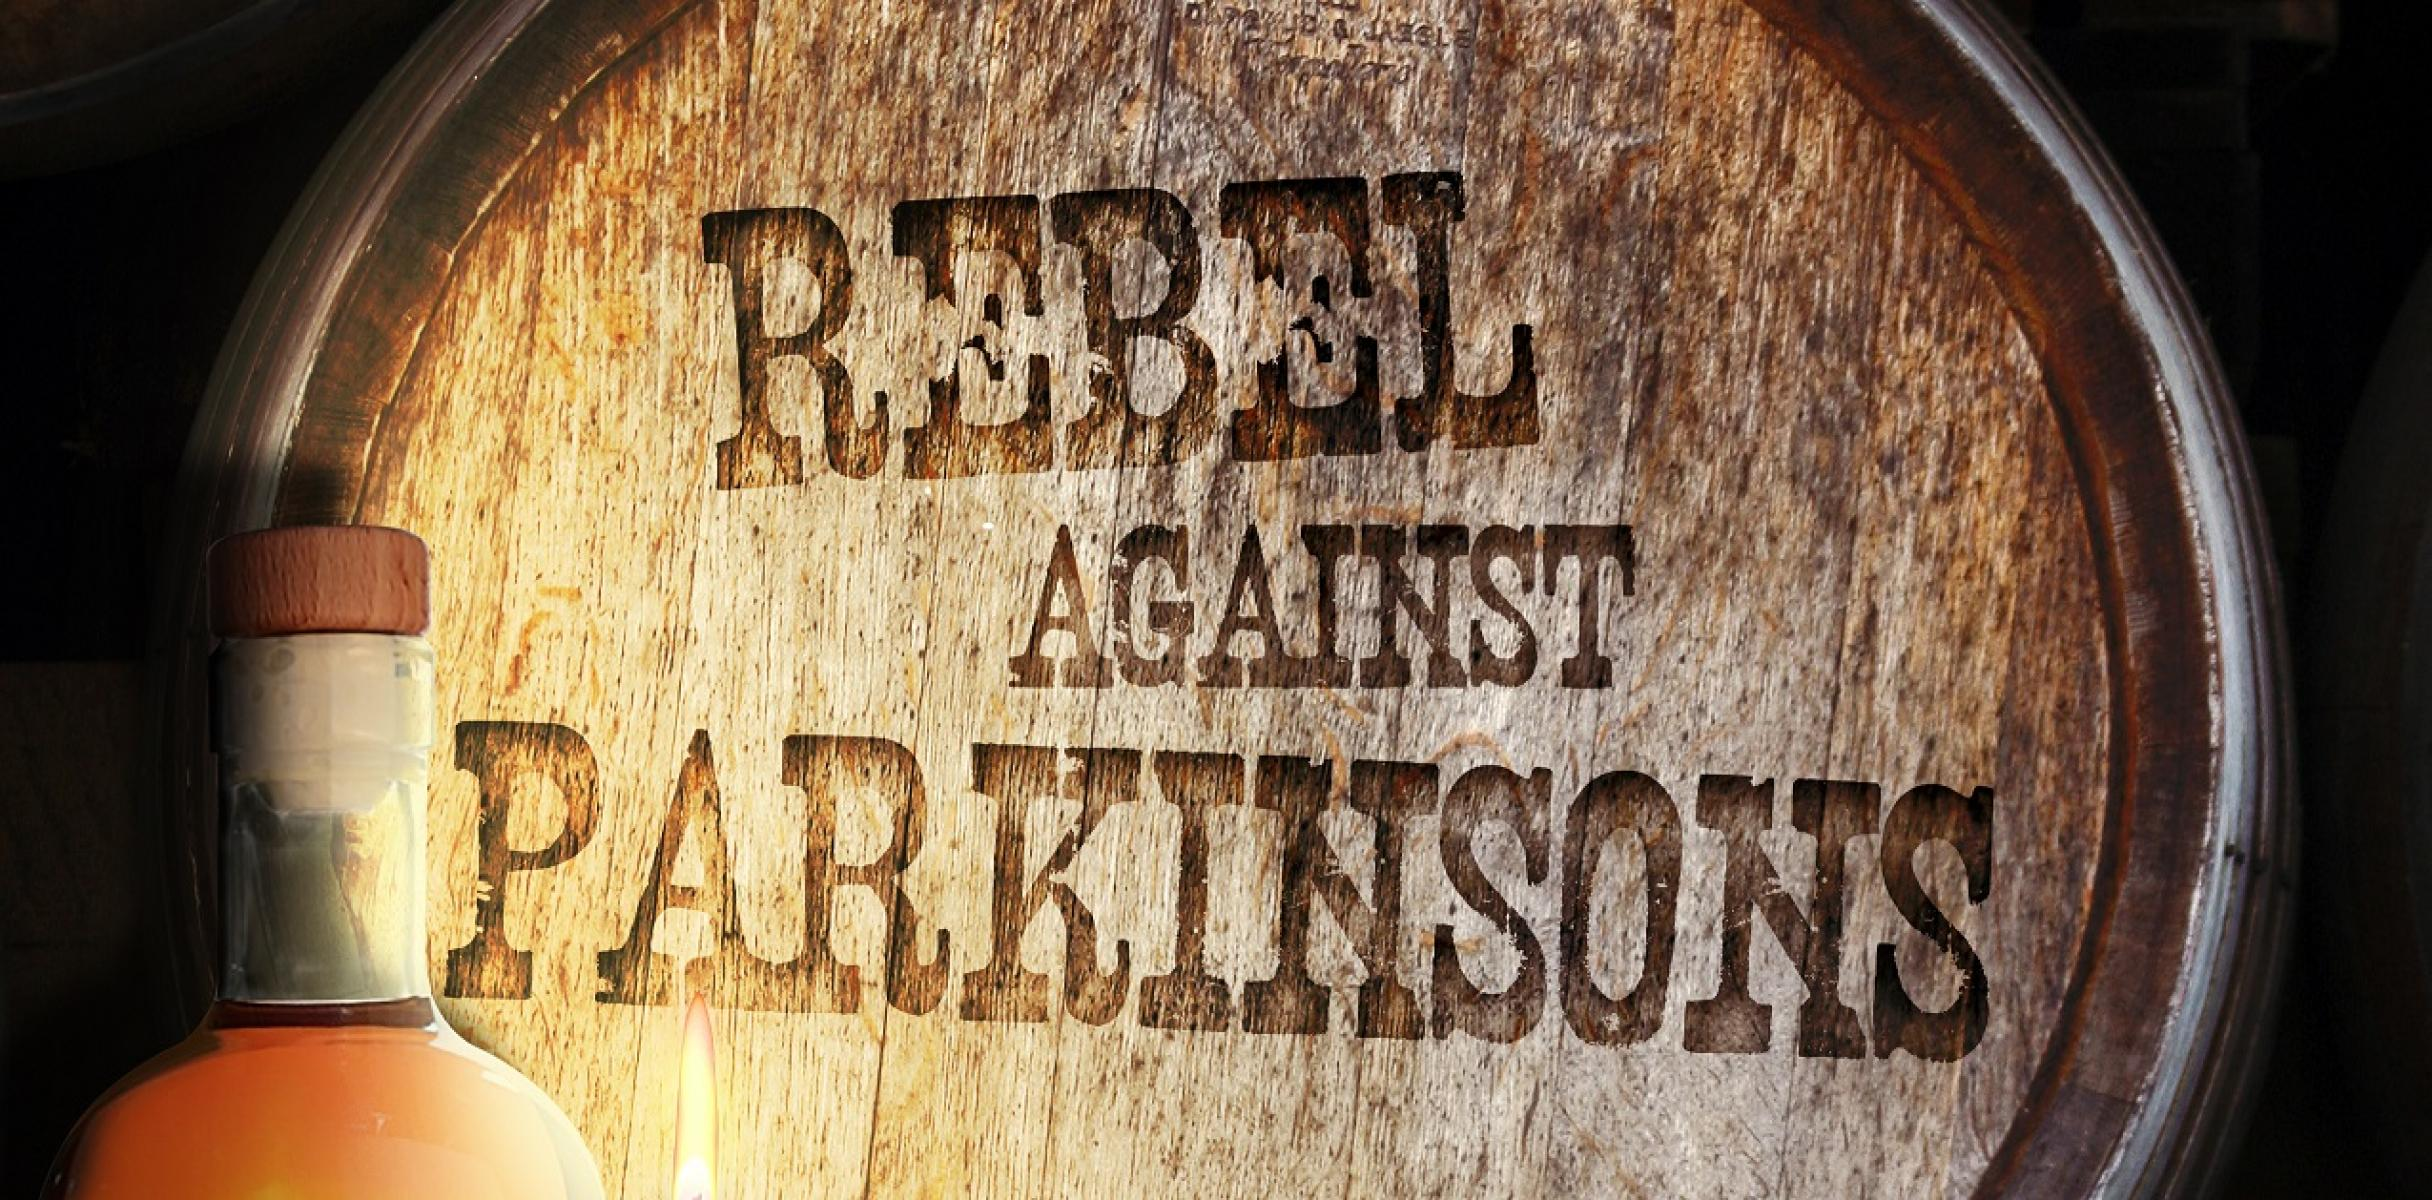 Rebel Against Parkinson's